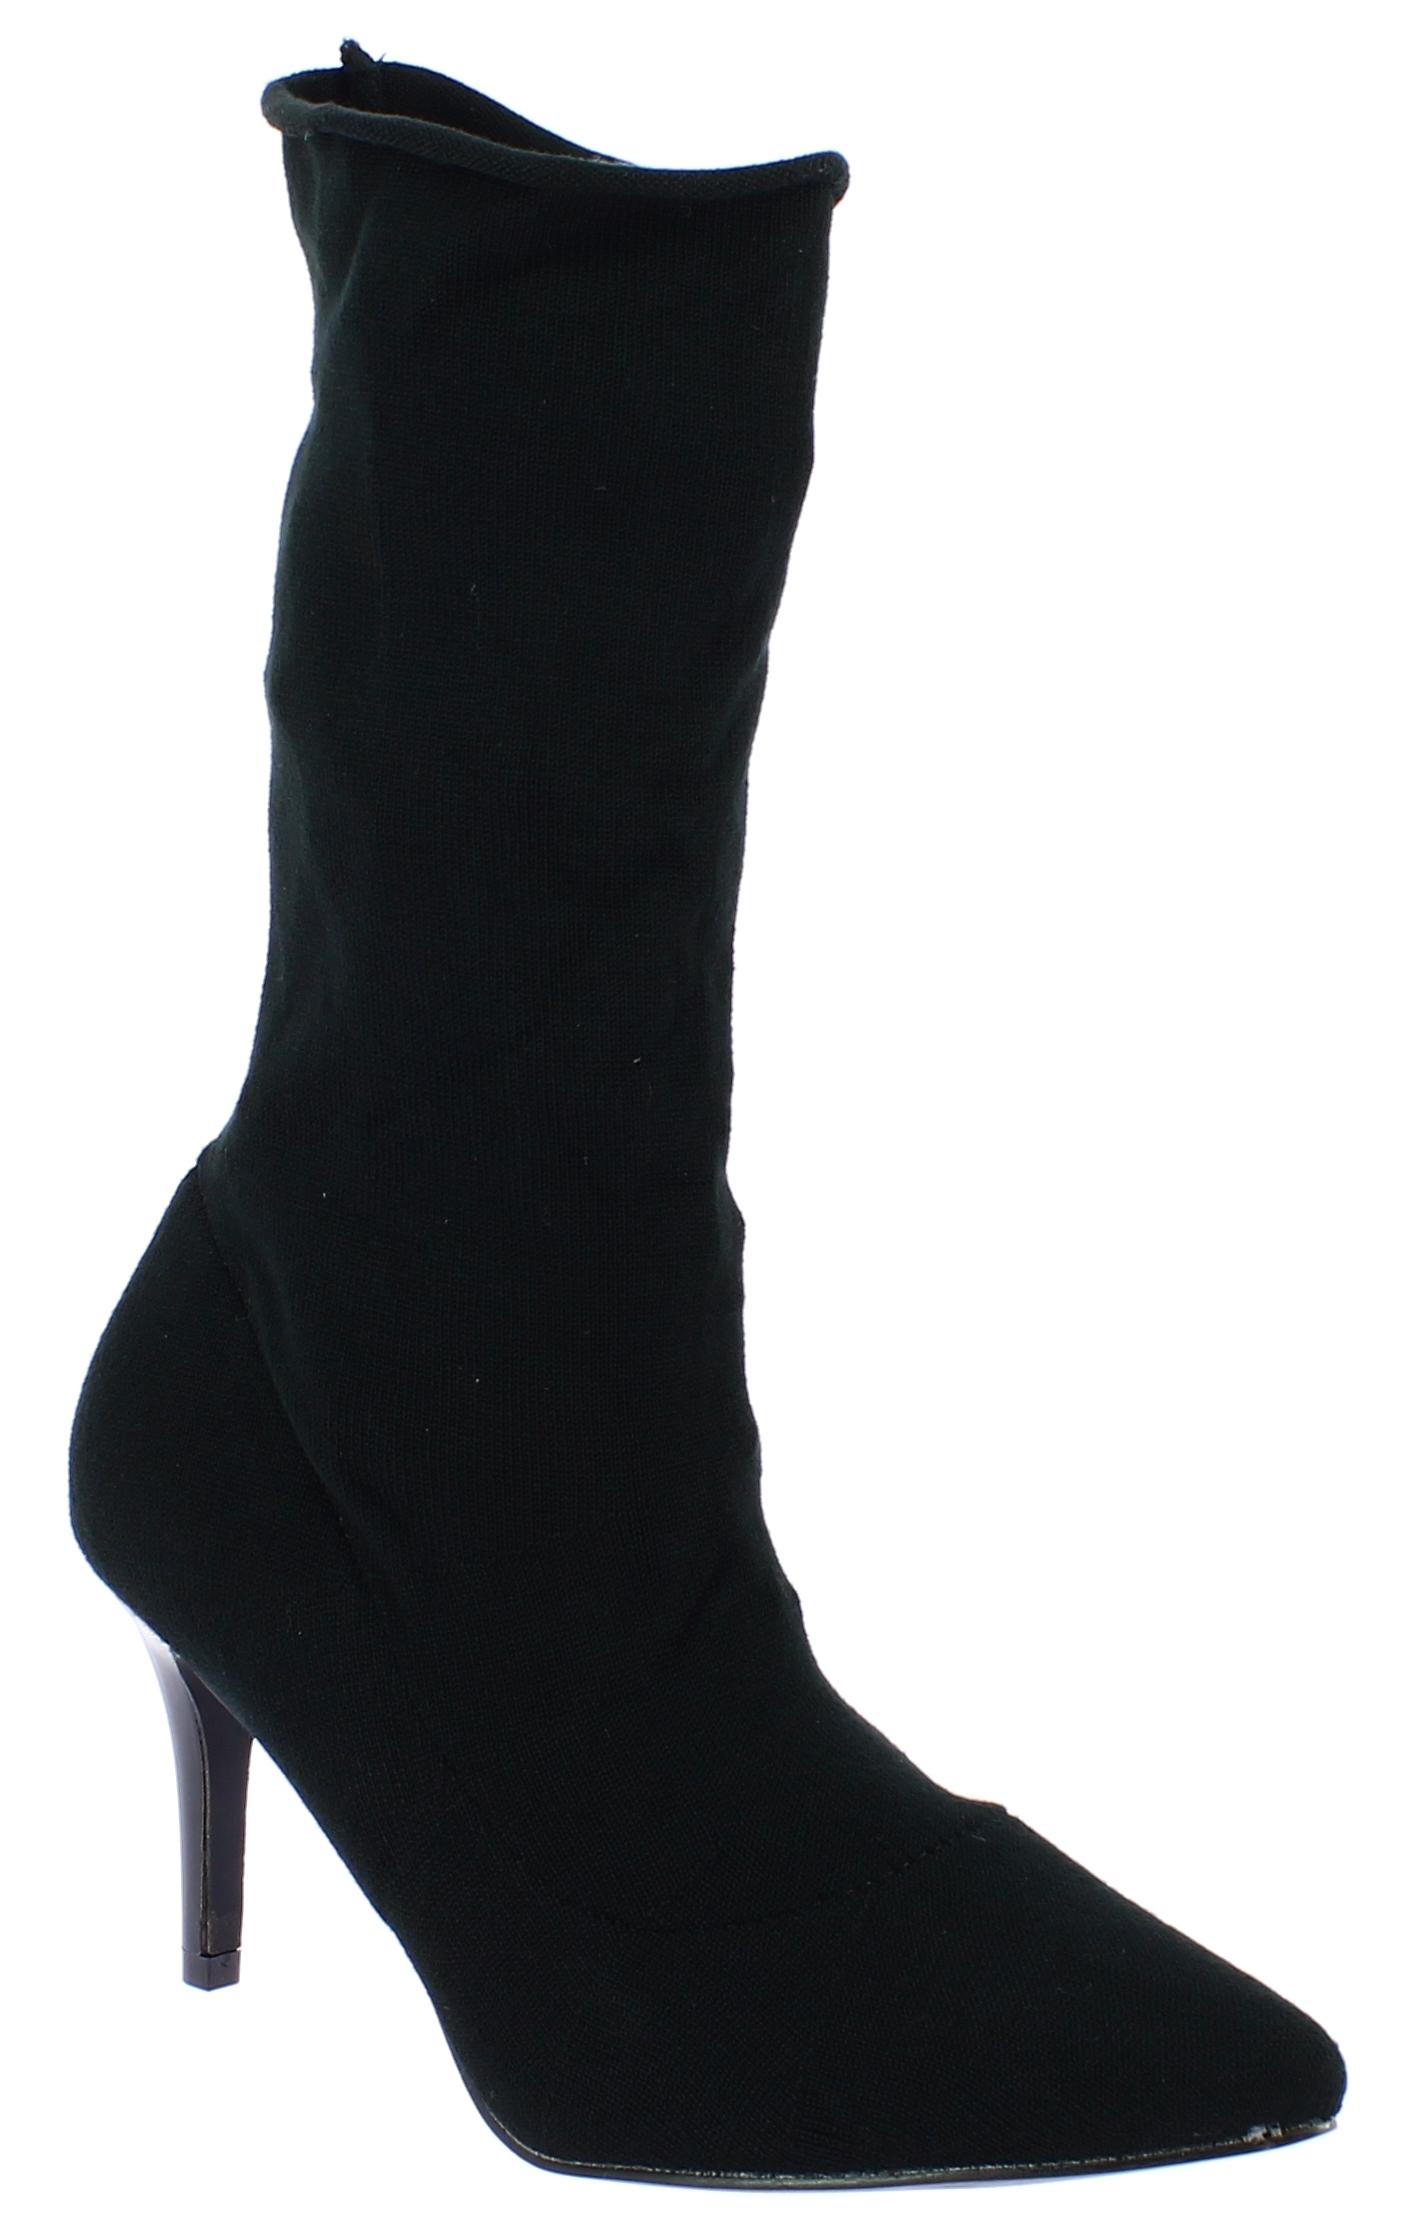 IQSHOES Γυναικεία Μποτάκι HD37 Μαύρο - IqShoes - HD37 BLACK-IQSHOES-black-39/1/1 παπούτσια  new in